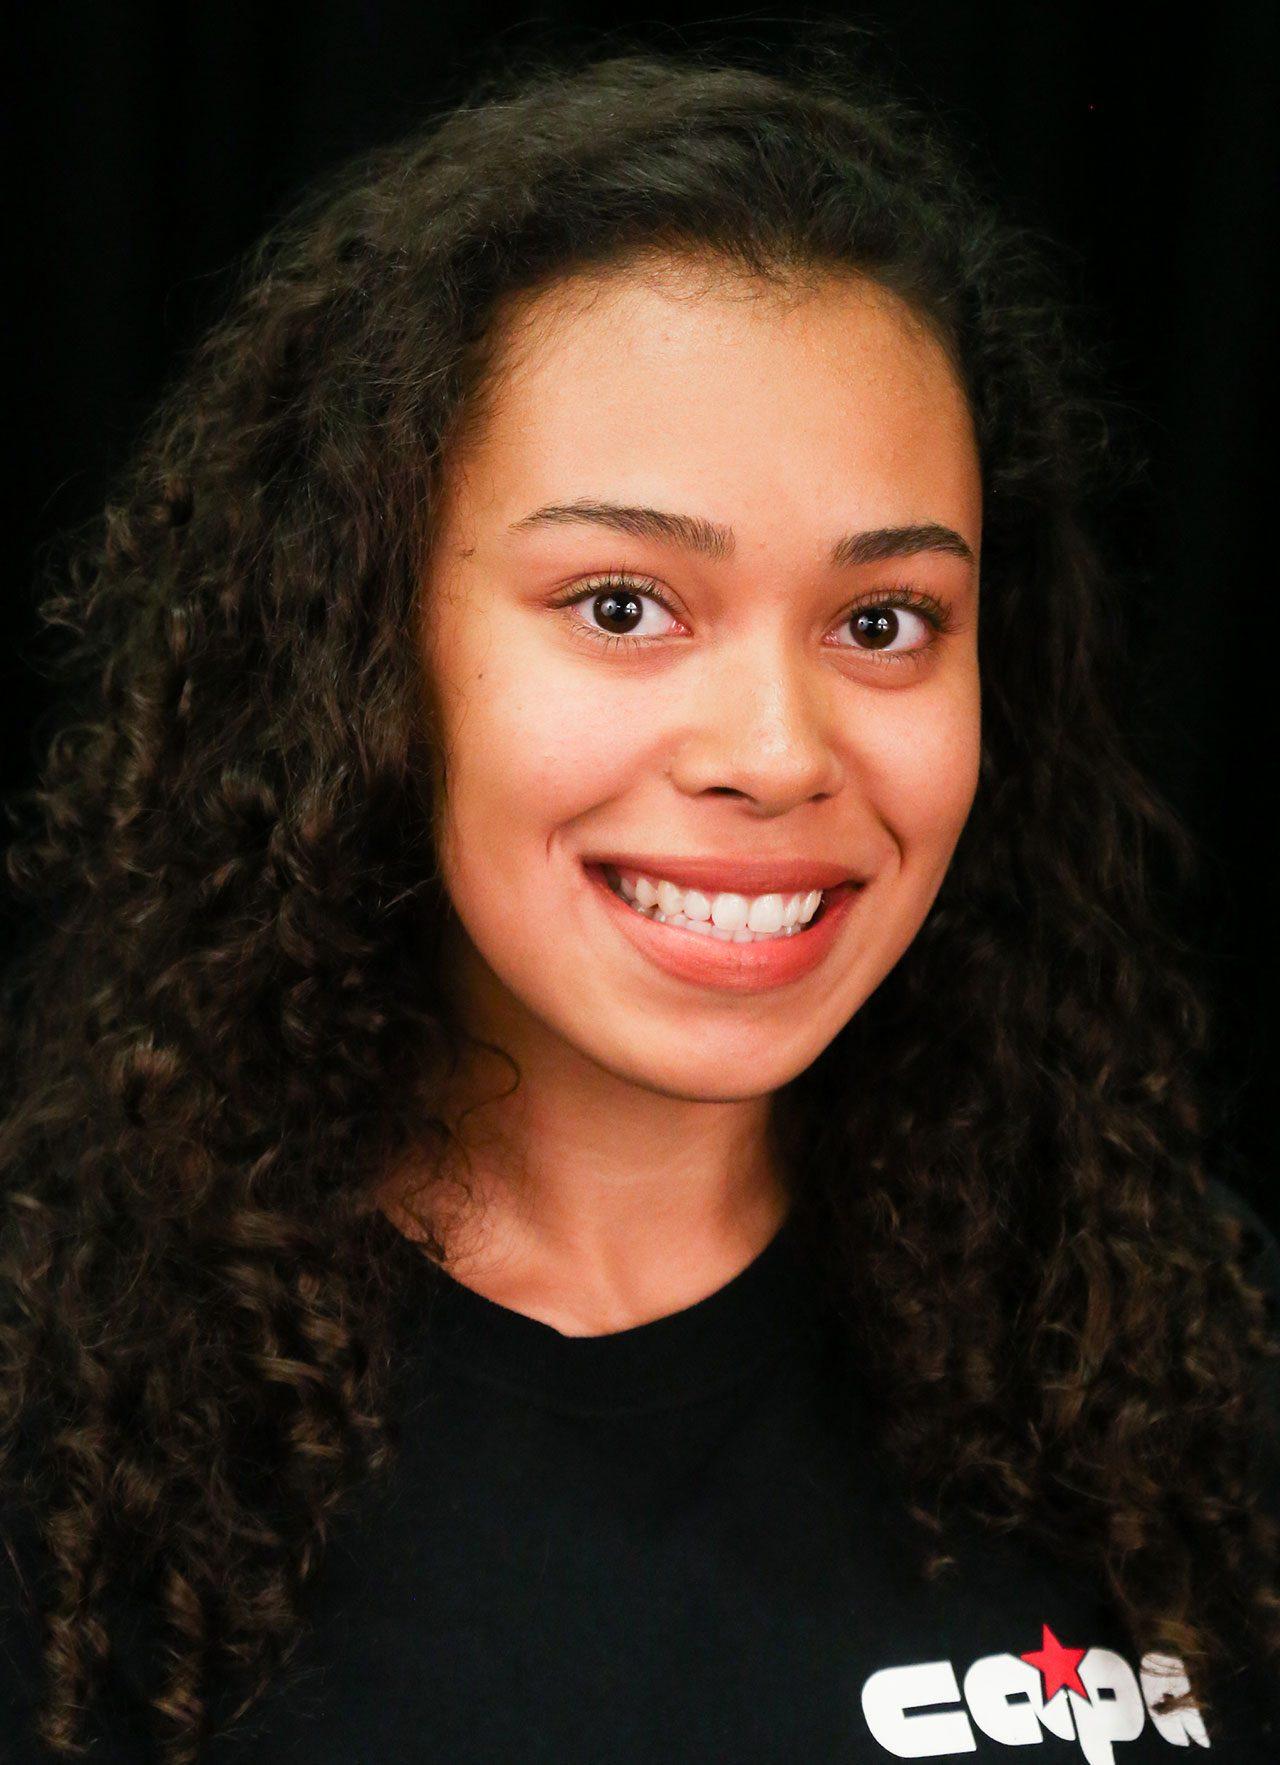 Naomi Lourd